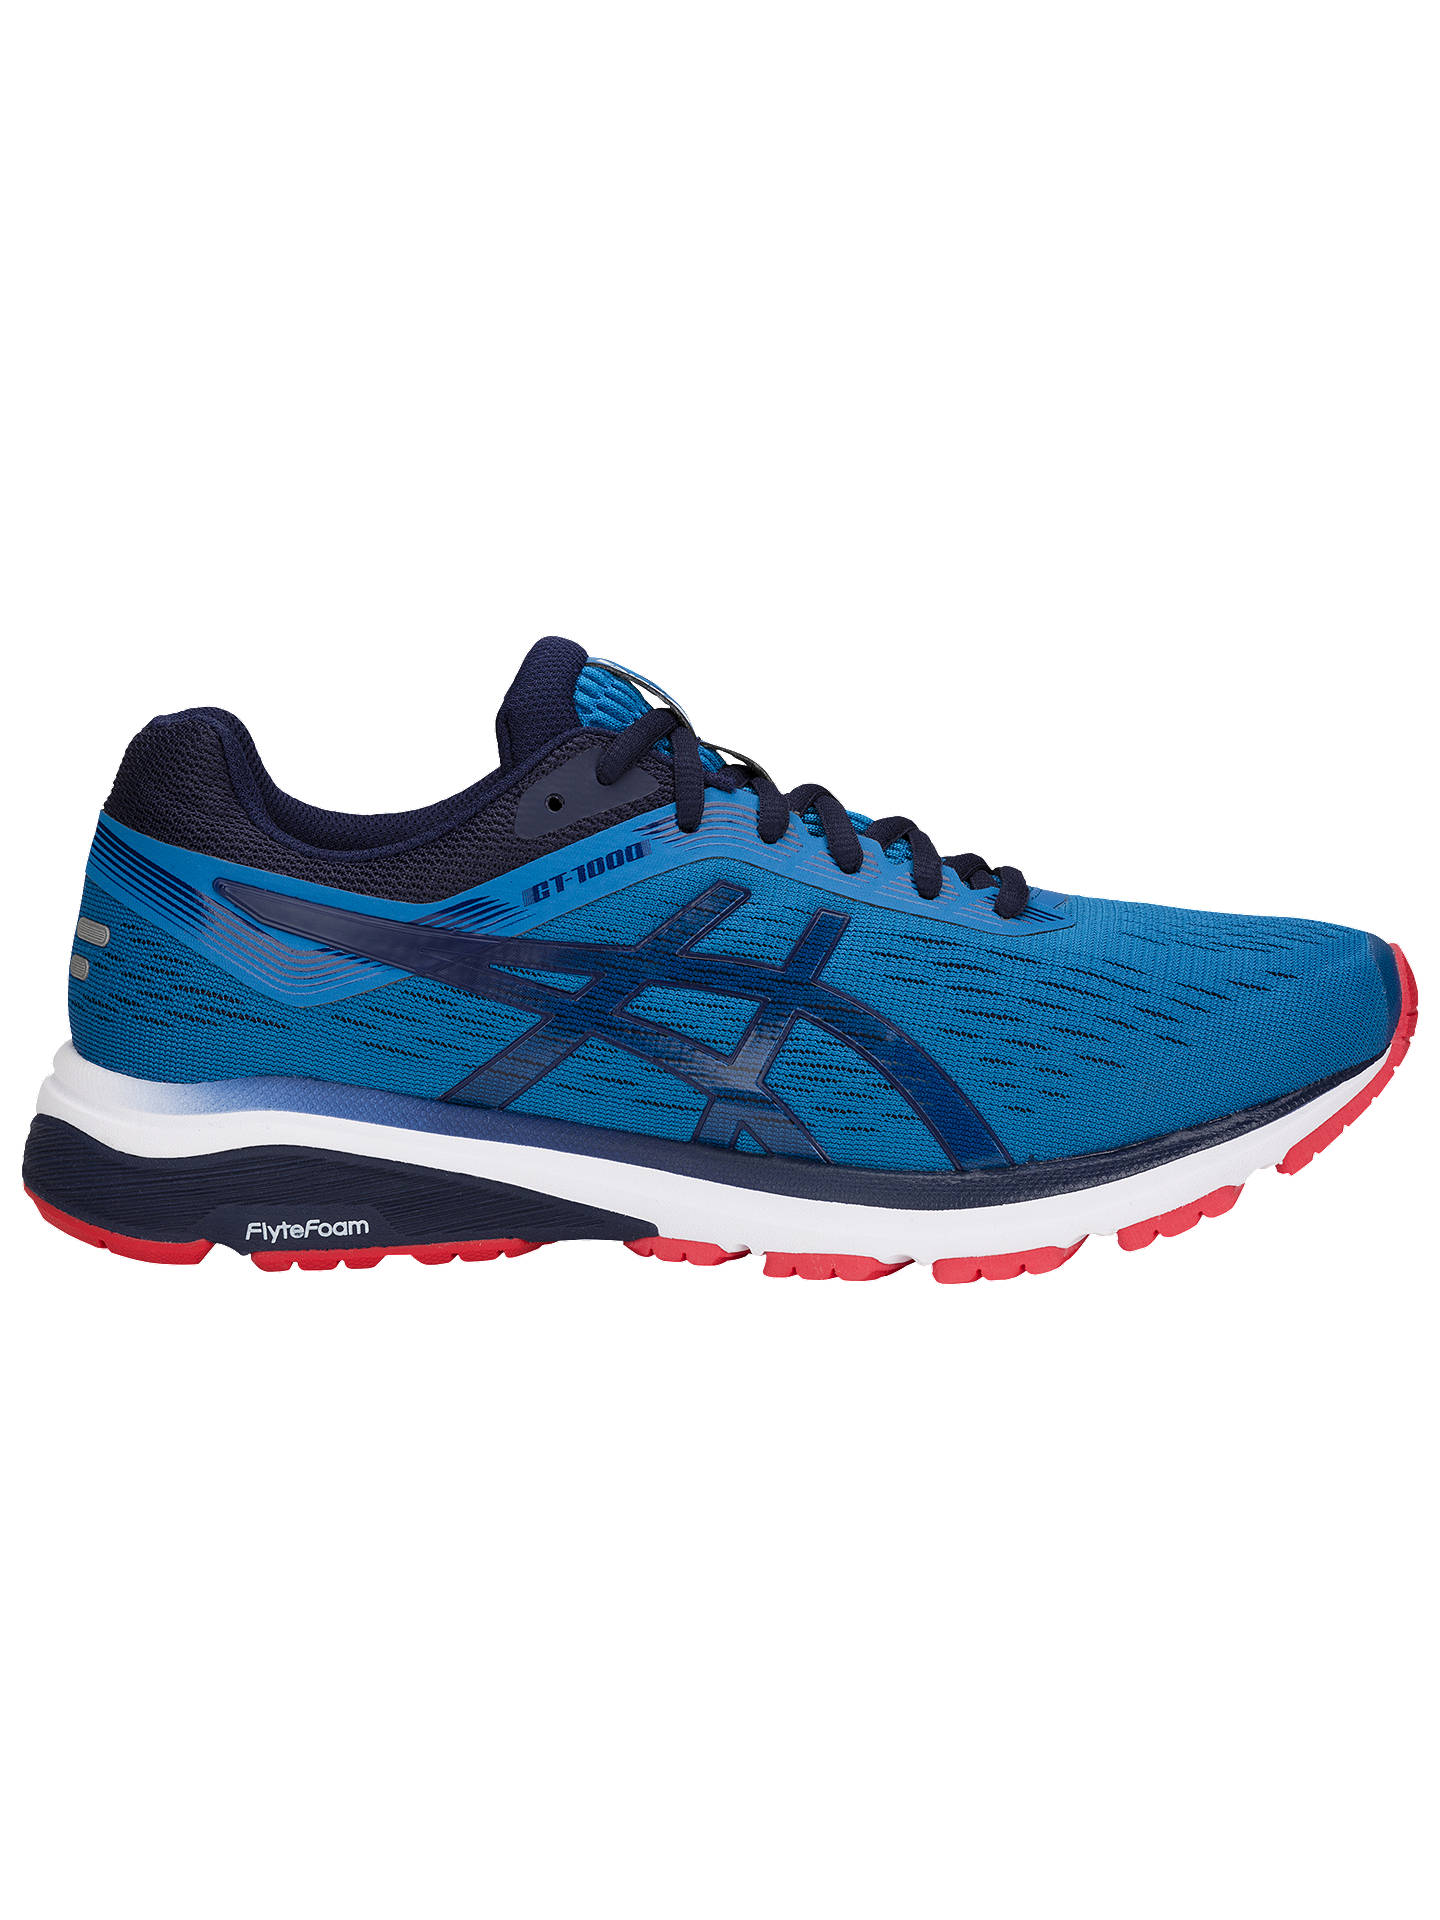 babc69d9b32c9 ASICS GT-1000 7 Men s Running Shoes at John Lewis   Partners